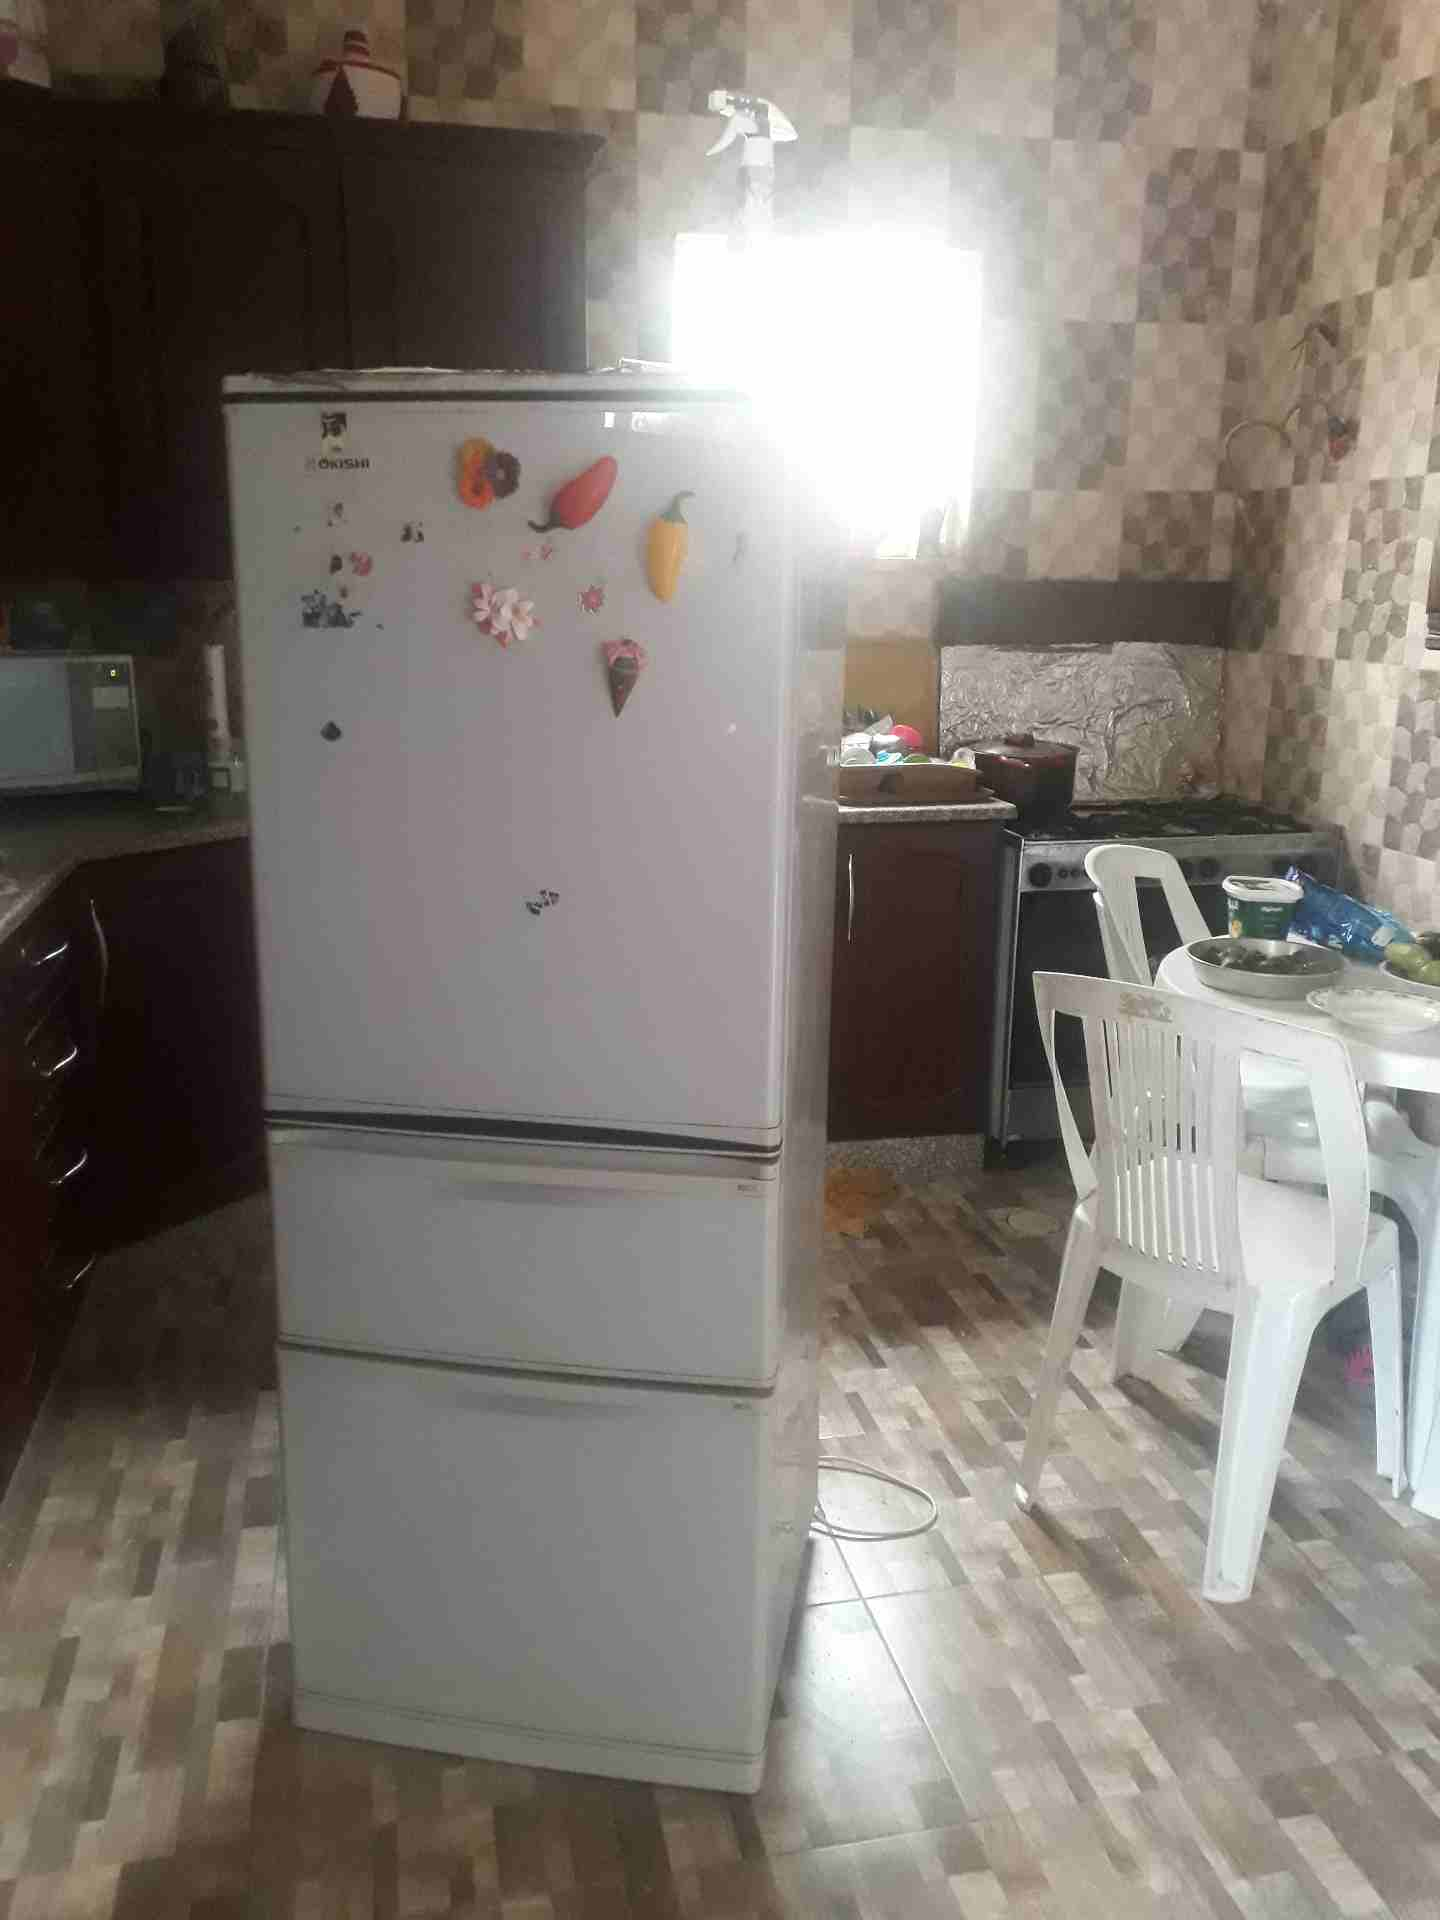 LG latest model fridge with 2doors up and down-  ثلاجه للبيع لا تنسَ أنك...